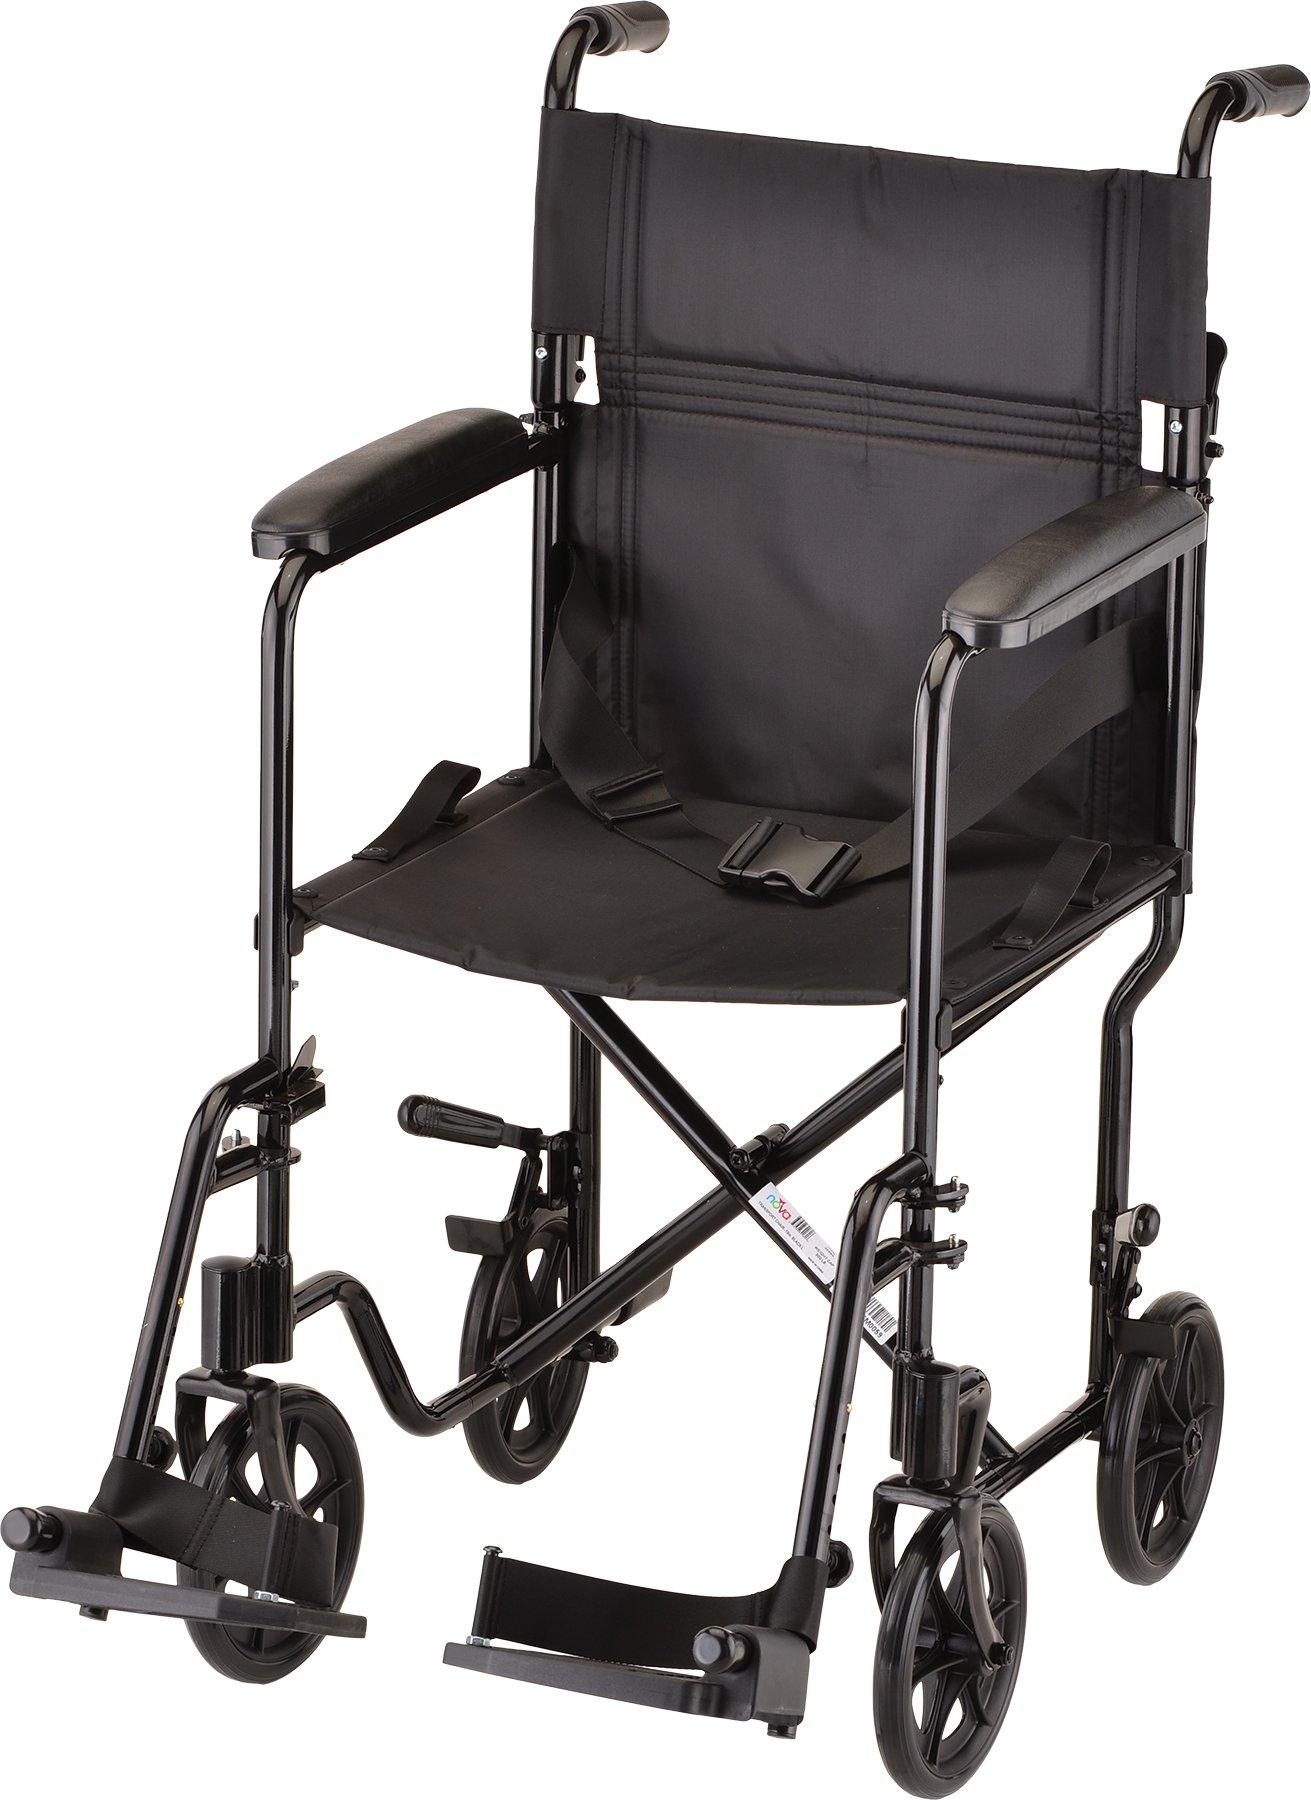 NOVA Medical Products 19'' Lightweight Transport/Wheelchair, Black